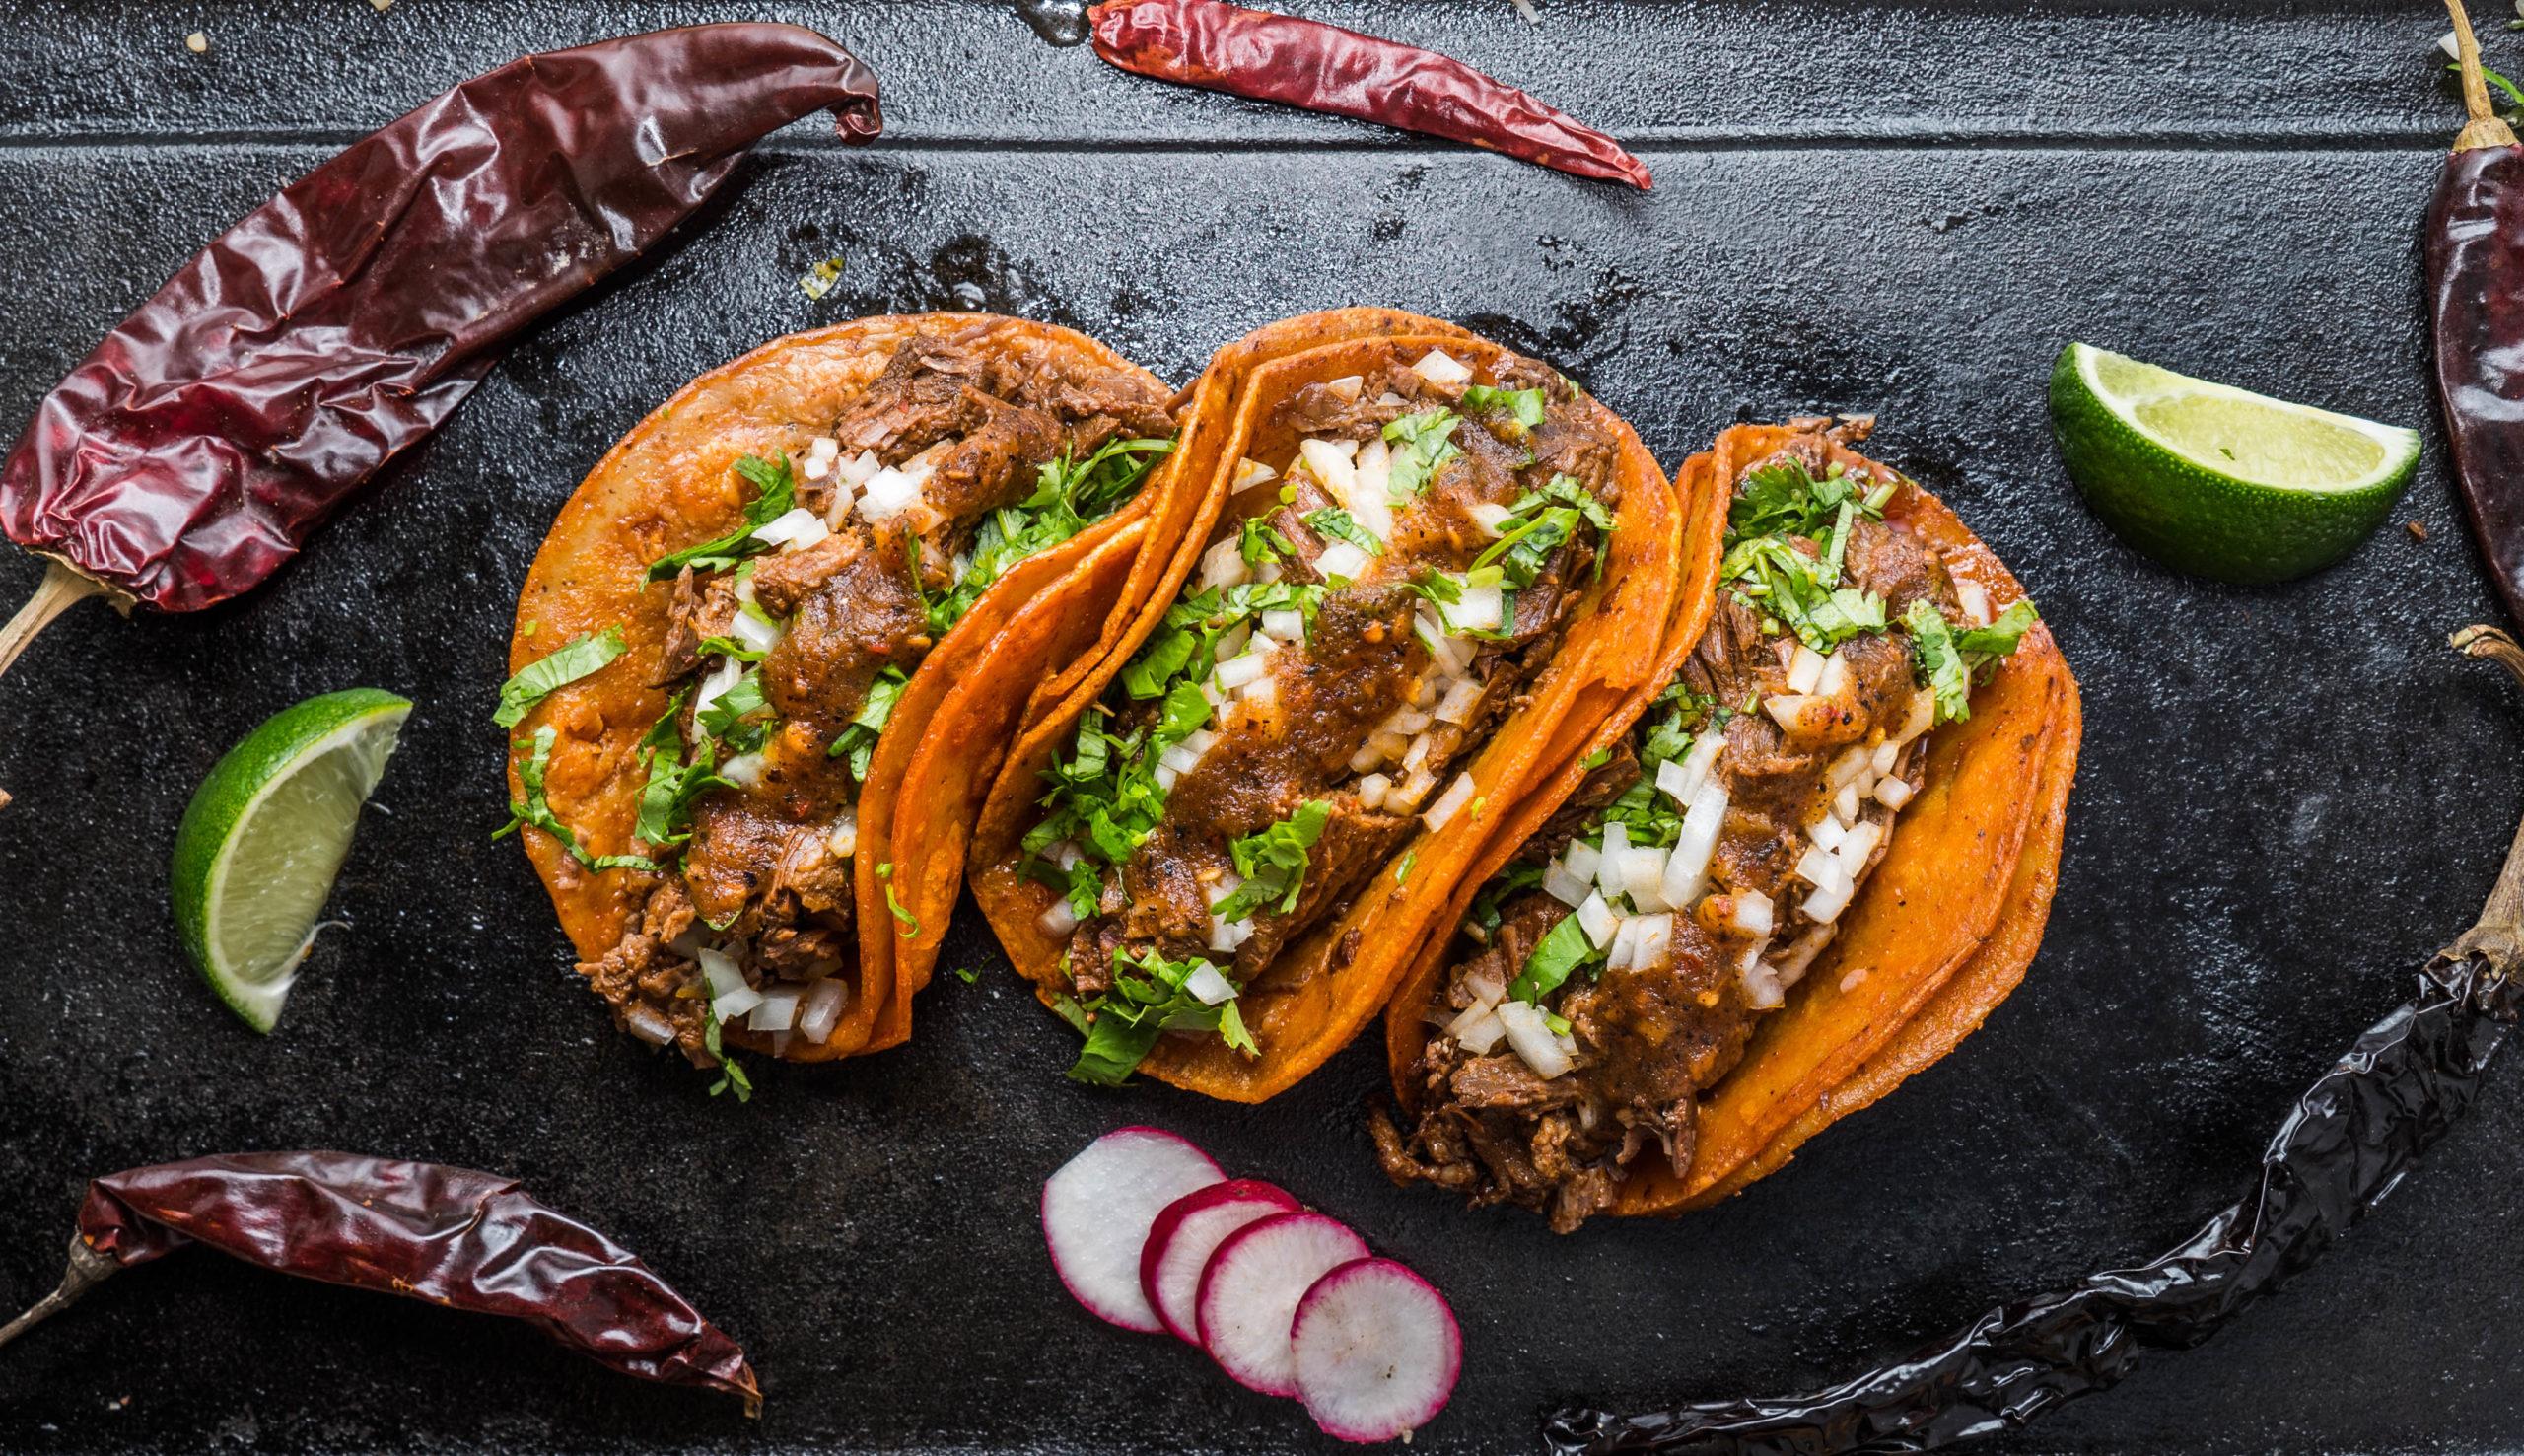 El Toro Rojo food truck birria tacos